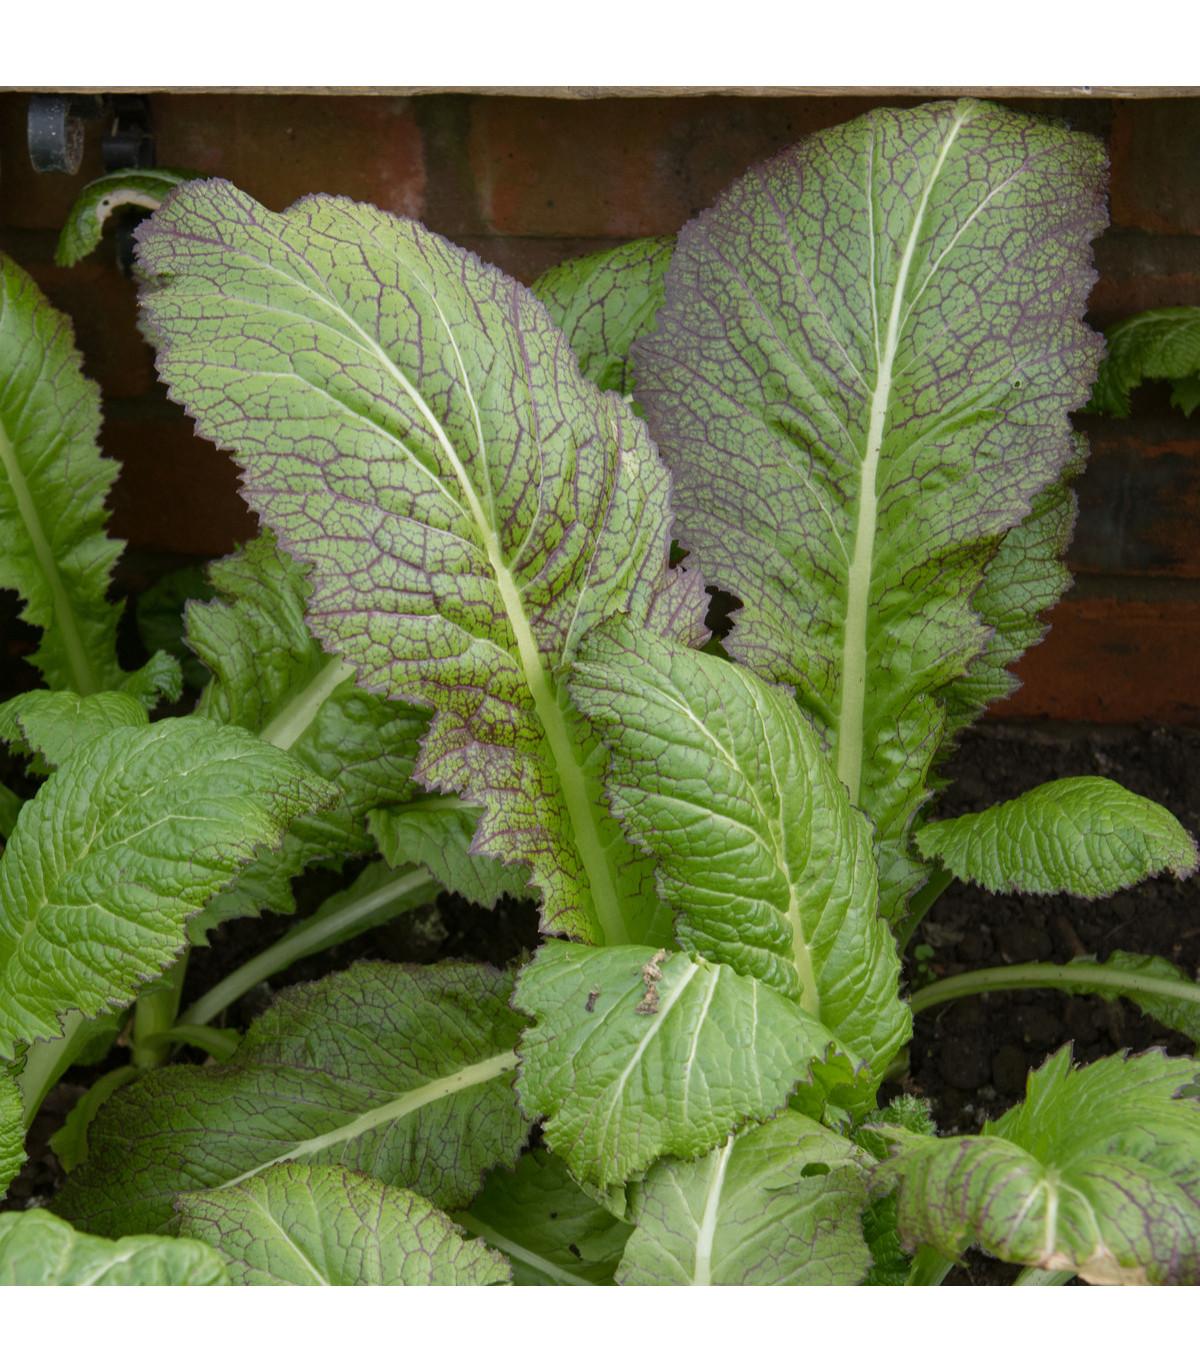 Hořčice habešská - Brassica carinata - prodej semen hořčice - 1 gr